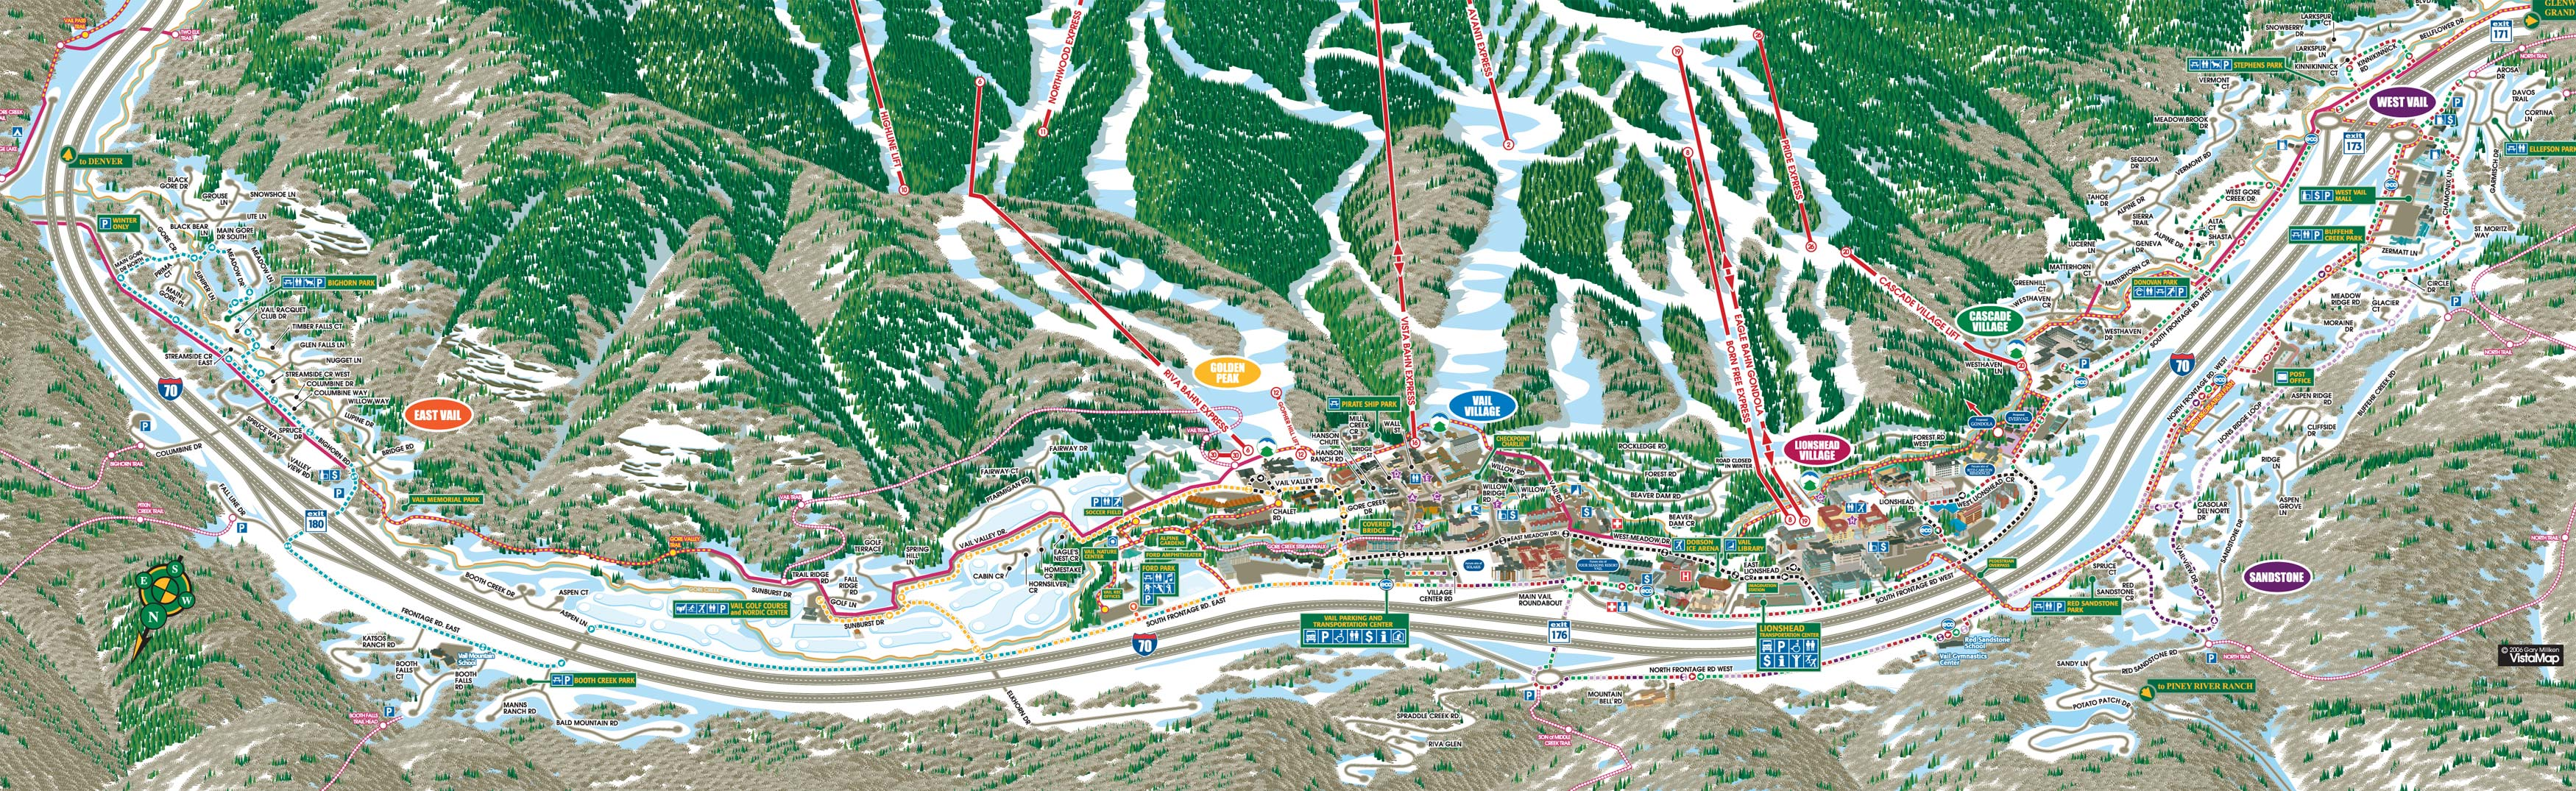 vail piste maps and ski resort map powderbeds